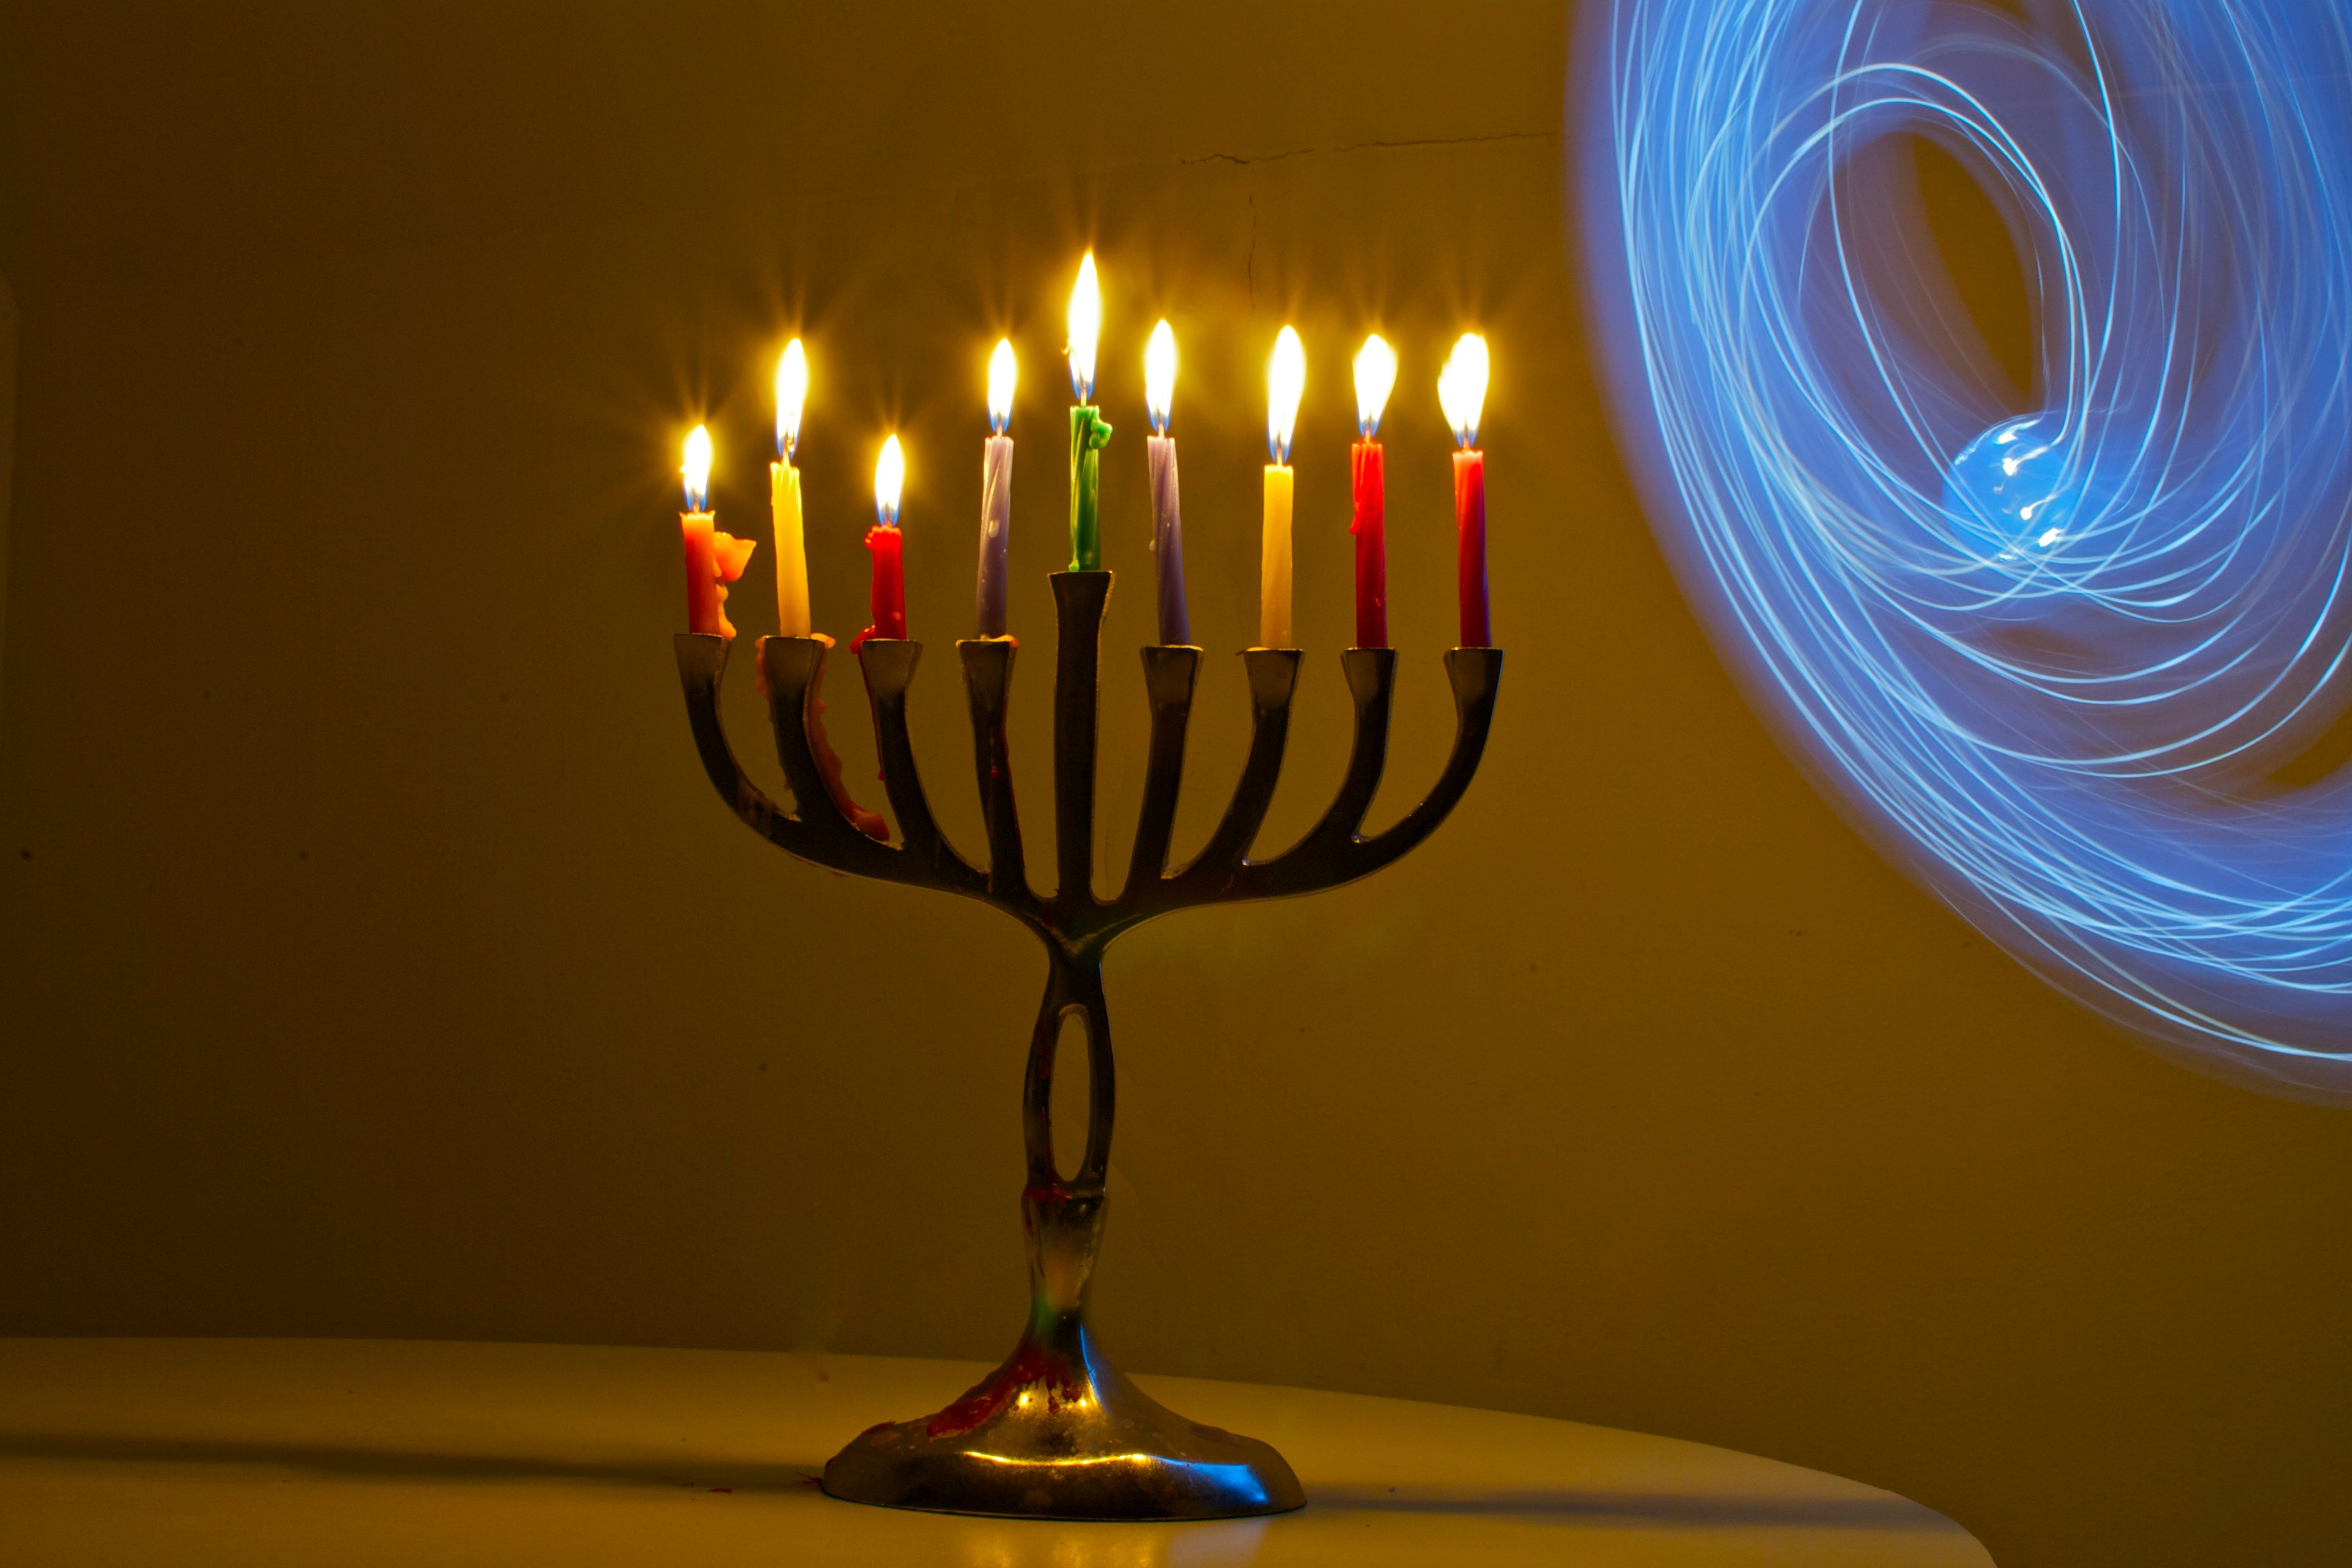 Holiday Hanukkah Wallpaper HD Wallpapers Download Free Images Wallpaper [1000image.com]